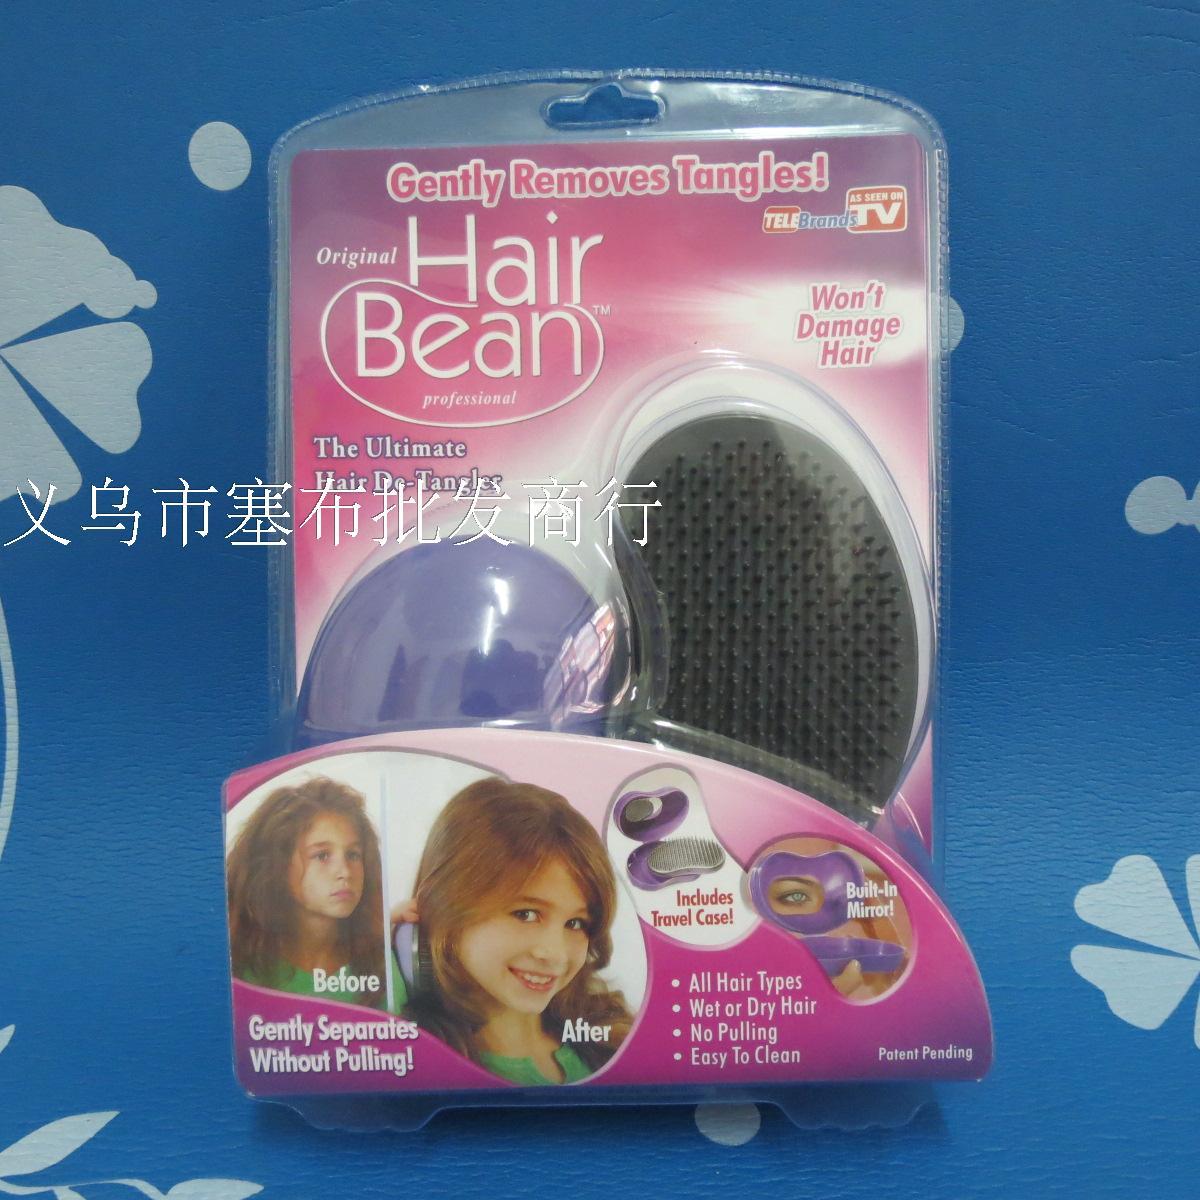 Массаж волос magic bean гребень гребень гребень волос